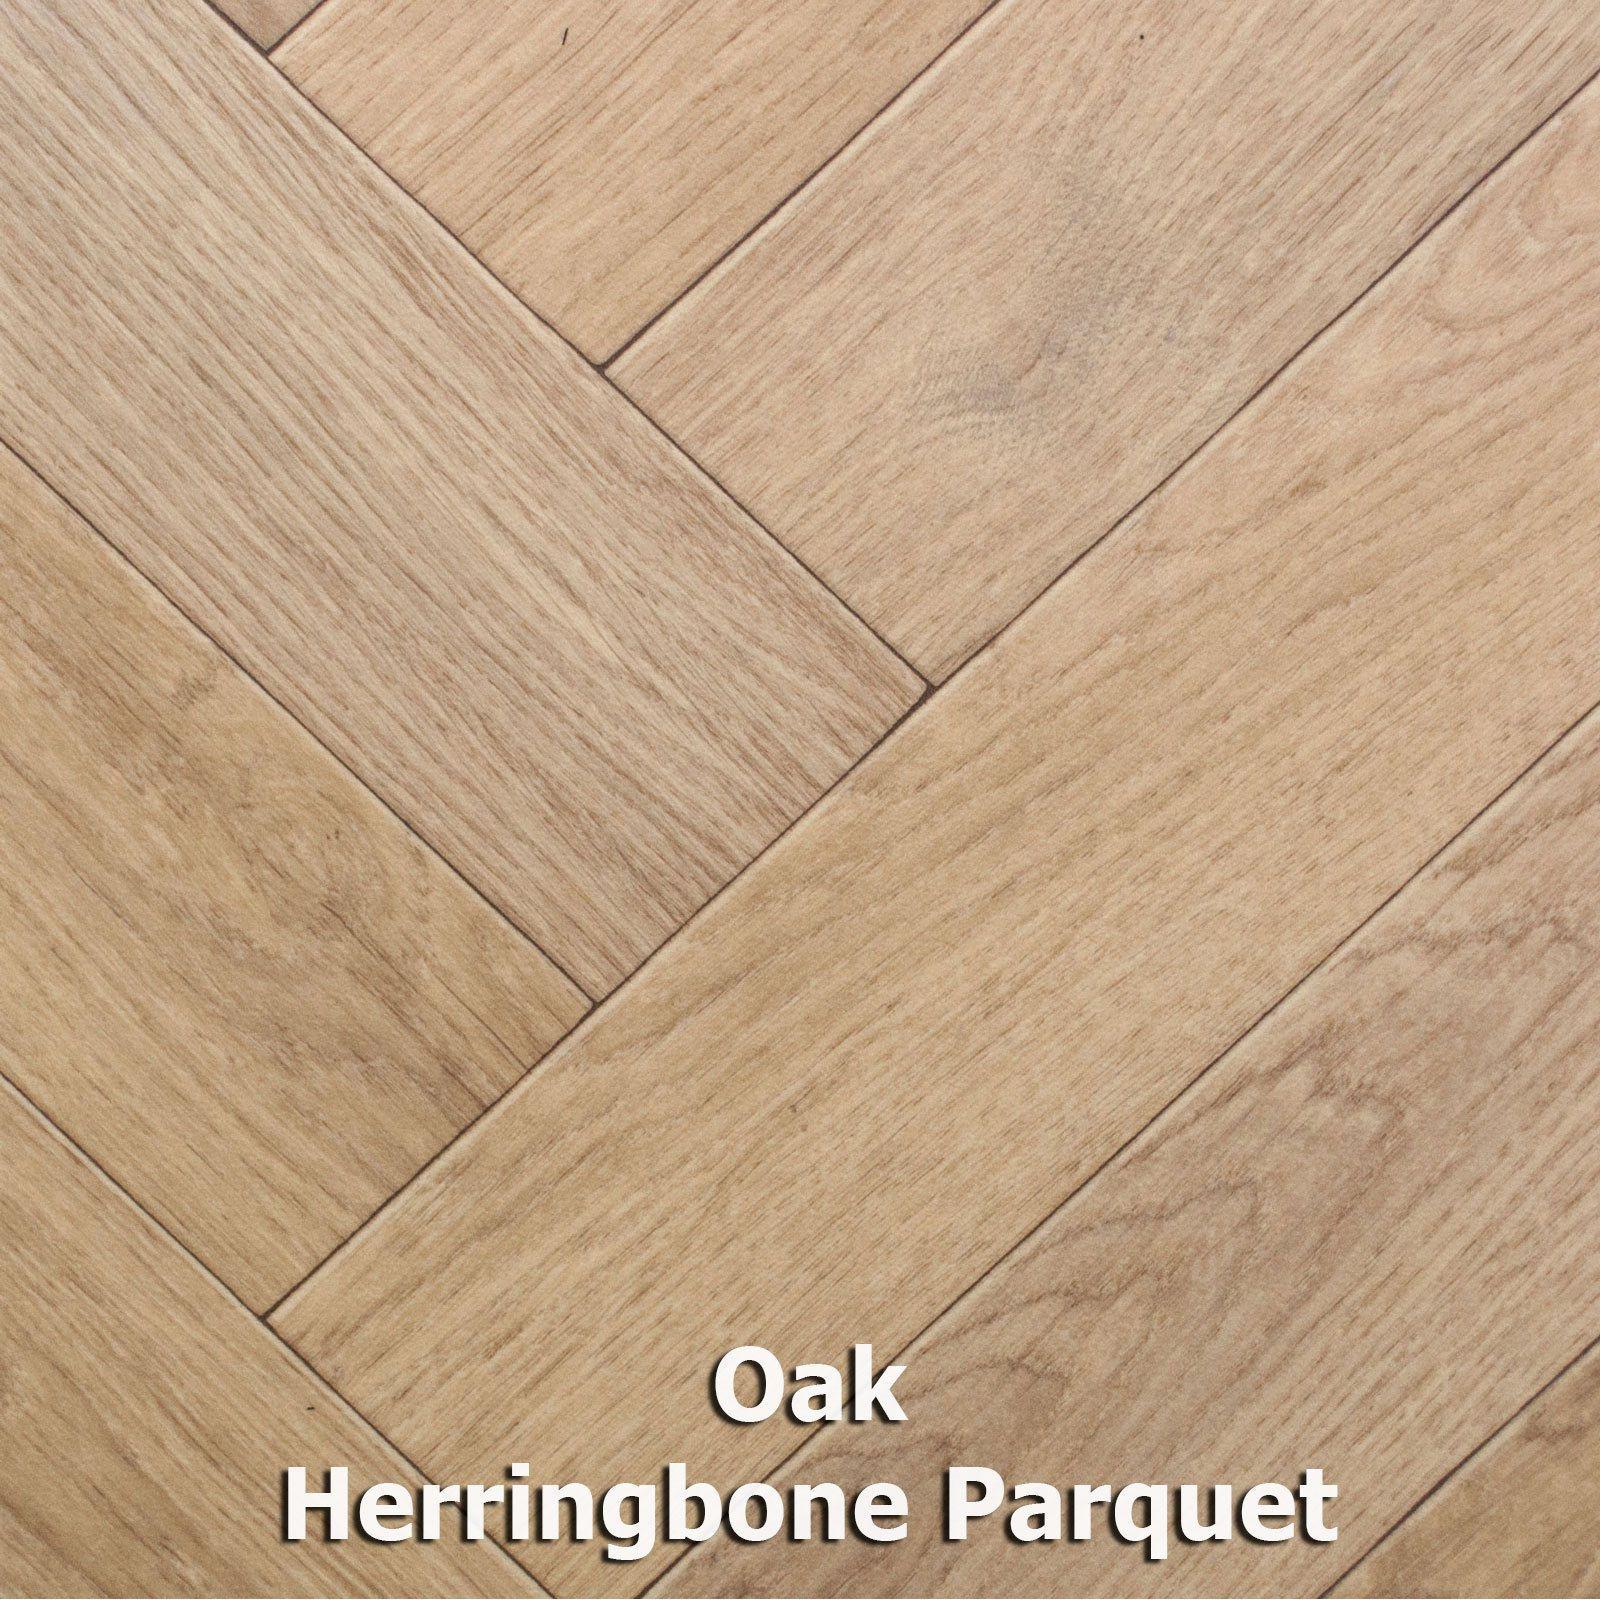 different width hardwood flooring of oak herringbone parquet wood style vinyl flooring 2m 3m 4m wide x pertaining to parquet wood vinyl flooring any